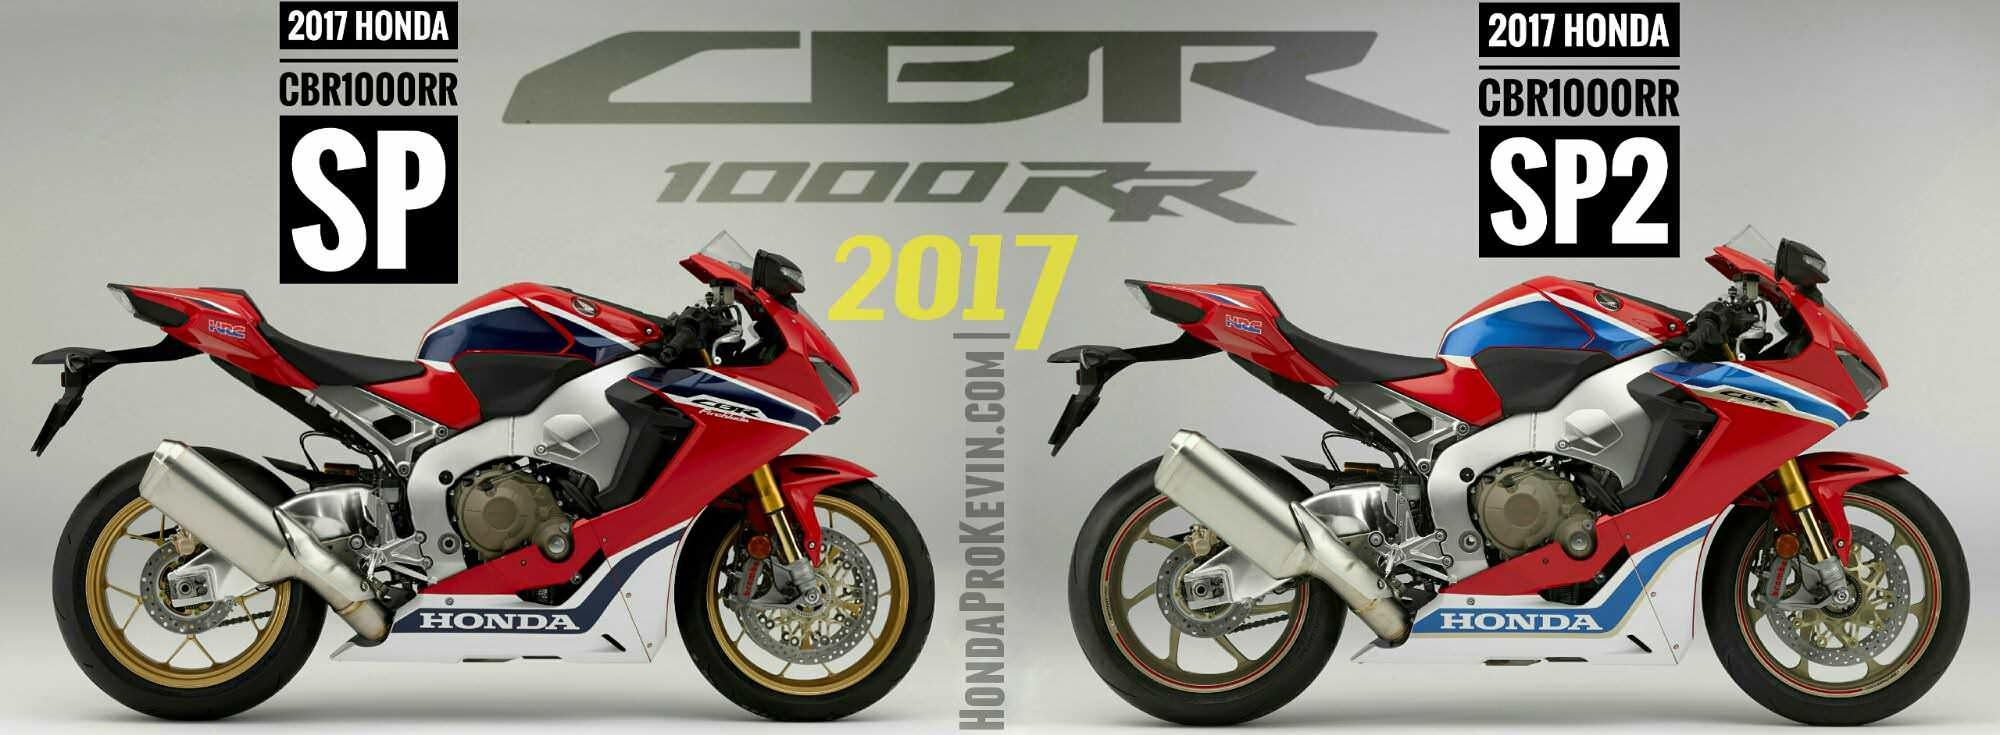 2017 honda cbr1000rr sp2